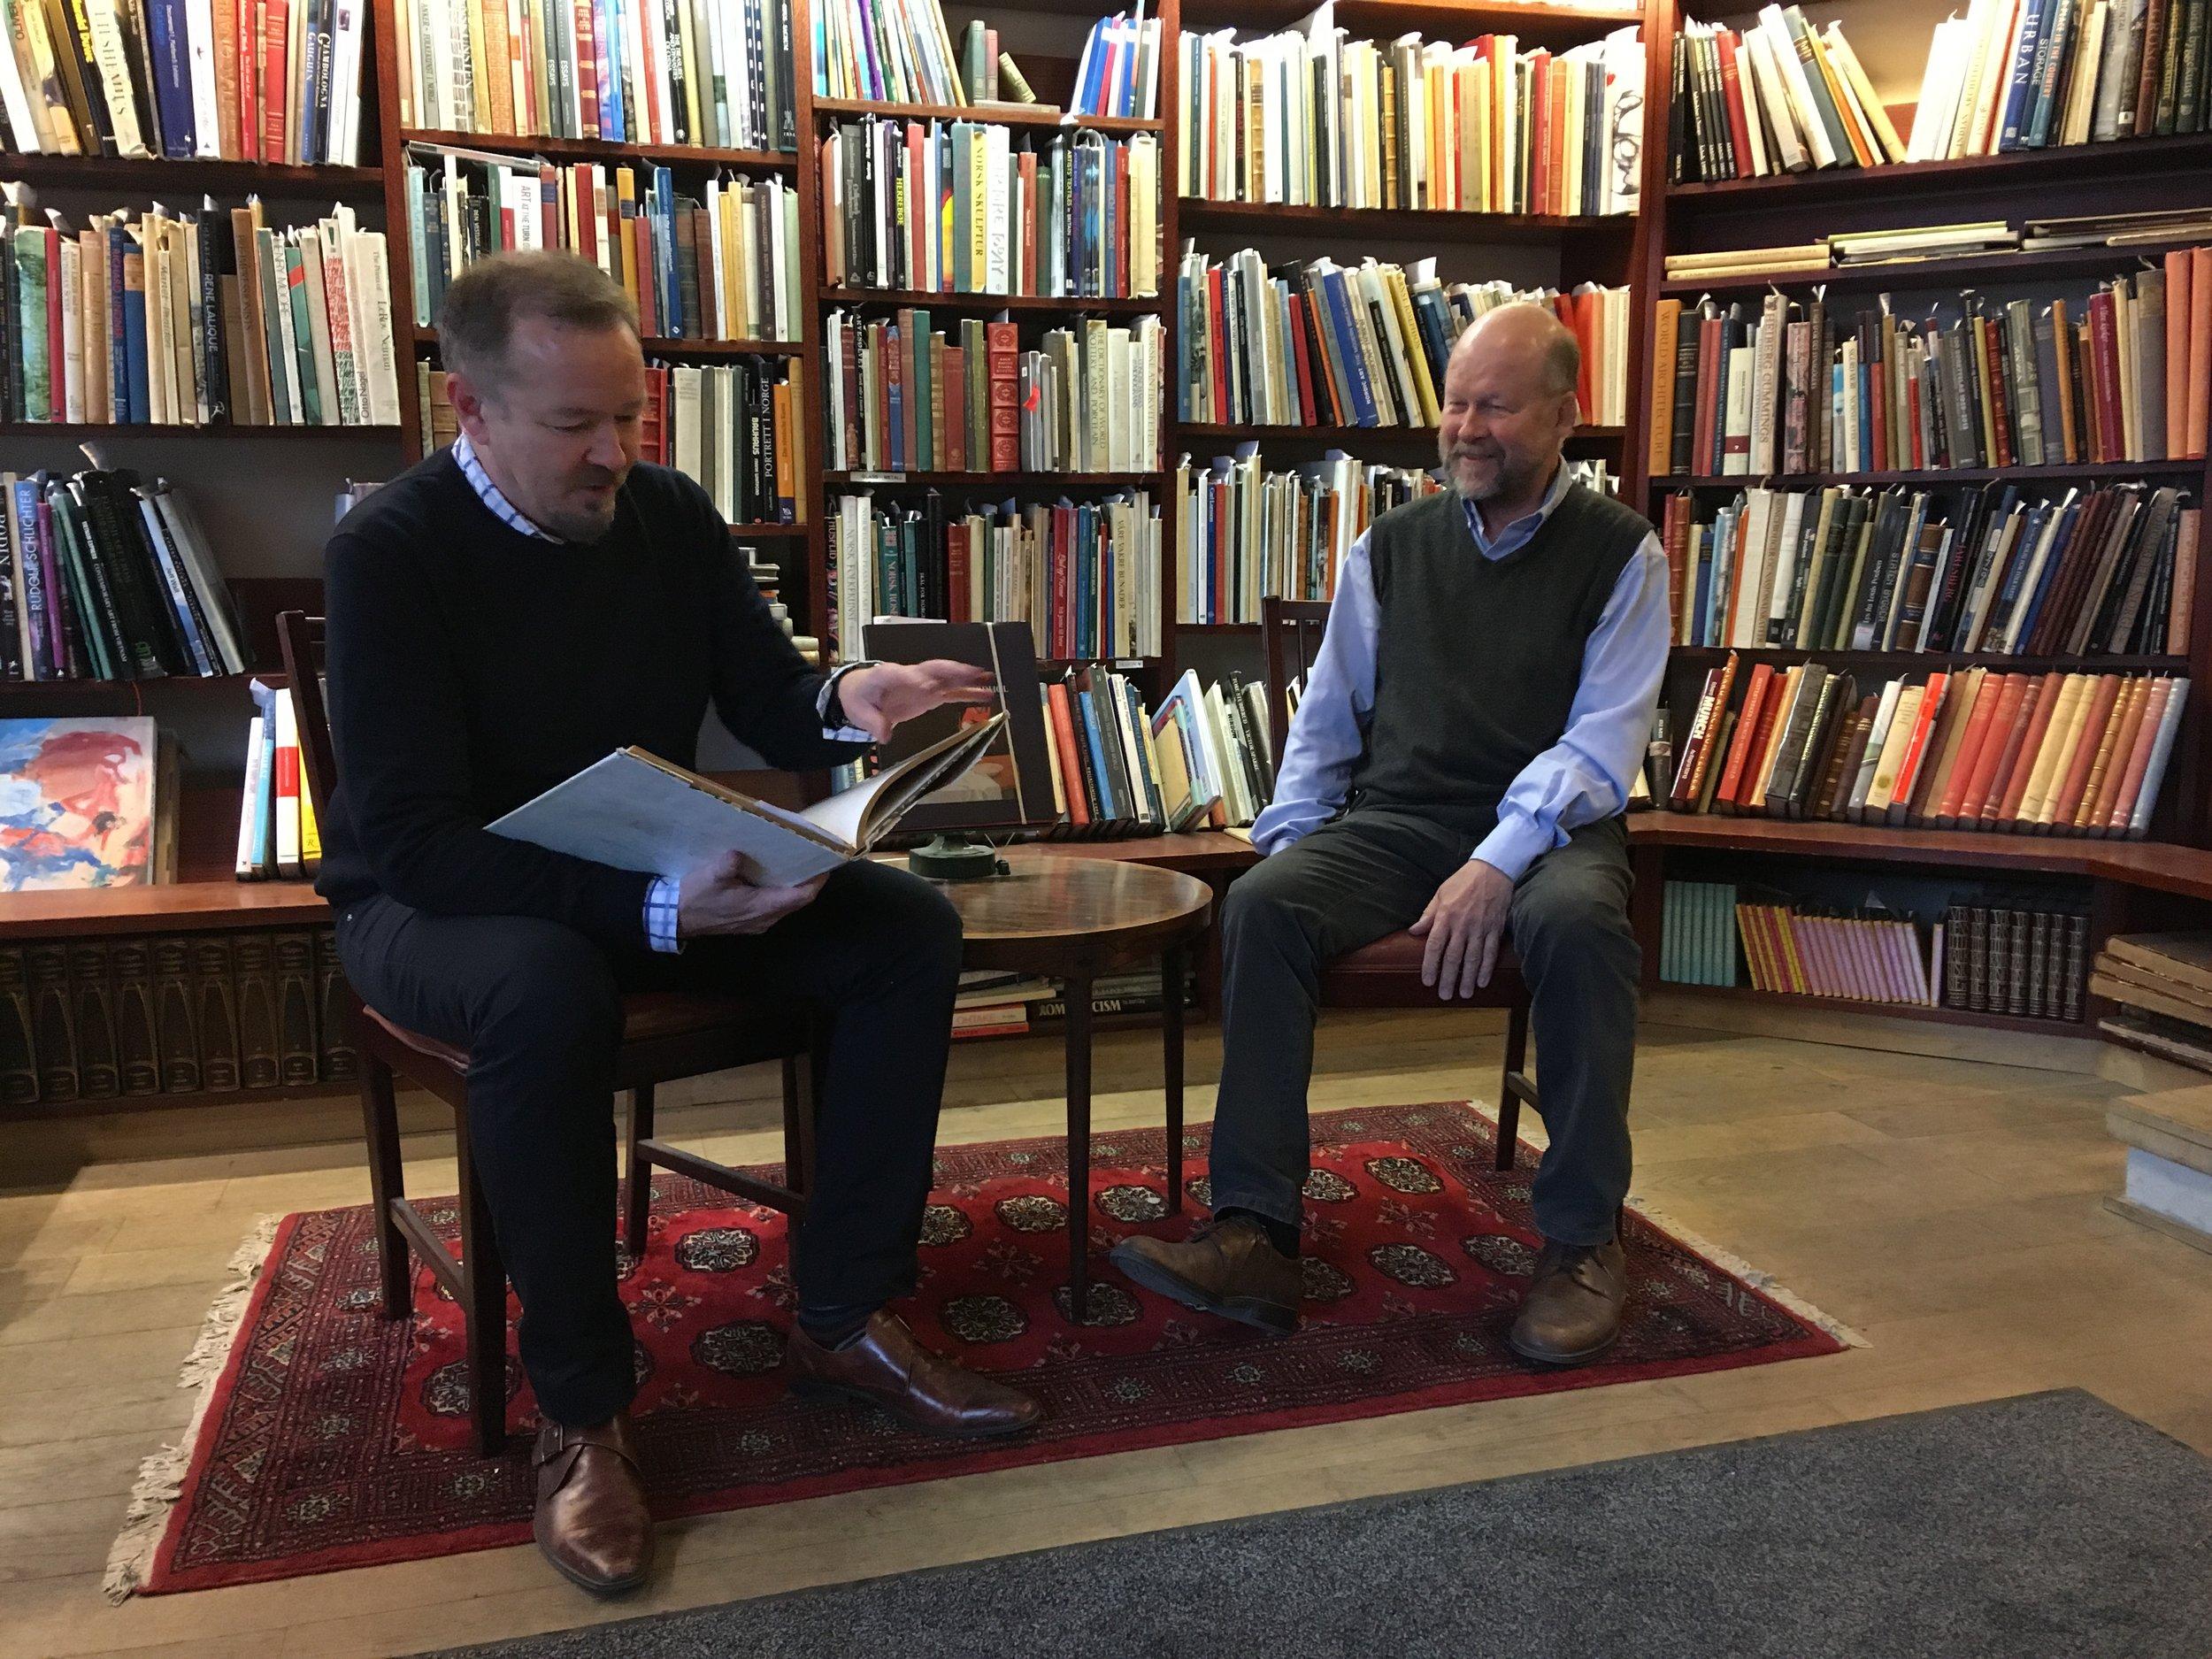 Thor Gunnar Næss (left) & Rolf Warendorph (right) ,  Photo credit:  Spencer W. Stuart , 2018.